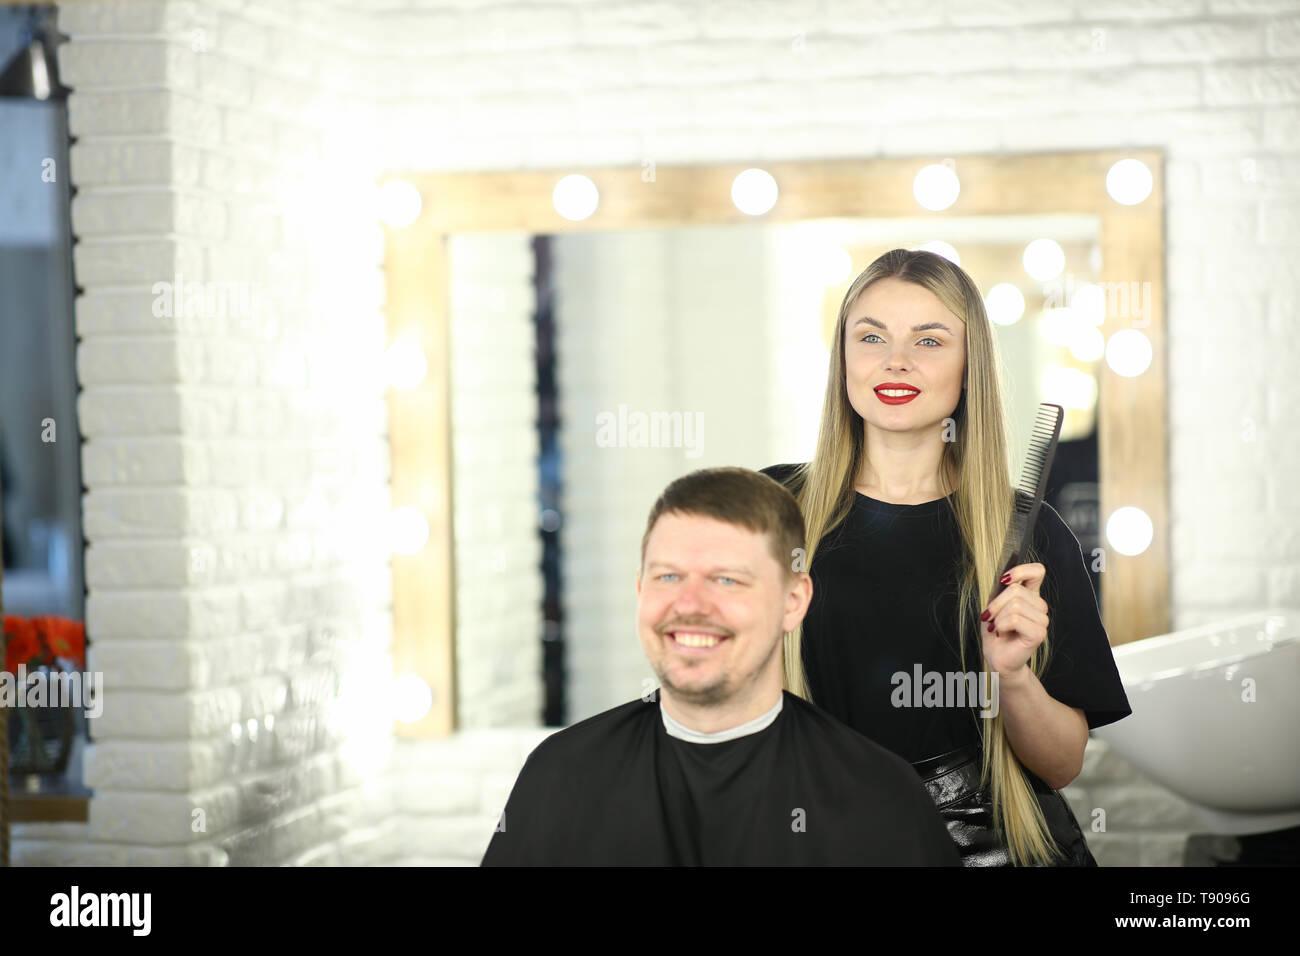 Girl Hairstylist and Man Customer in Beauty Studio Stock Photo